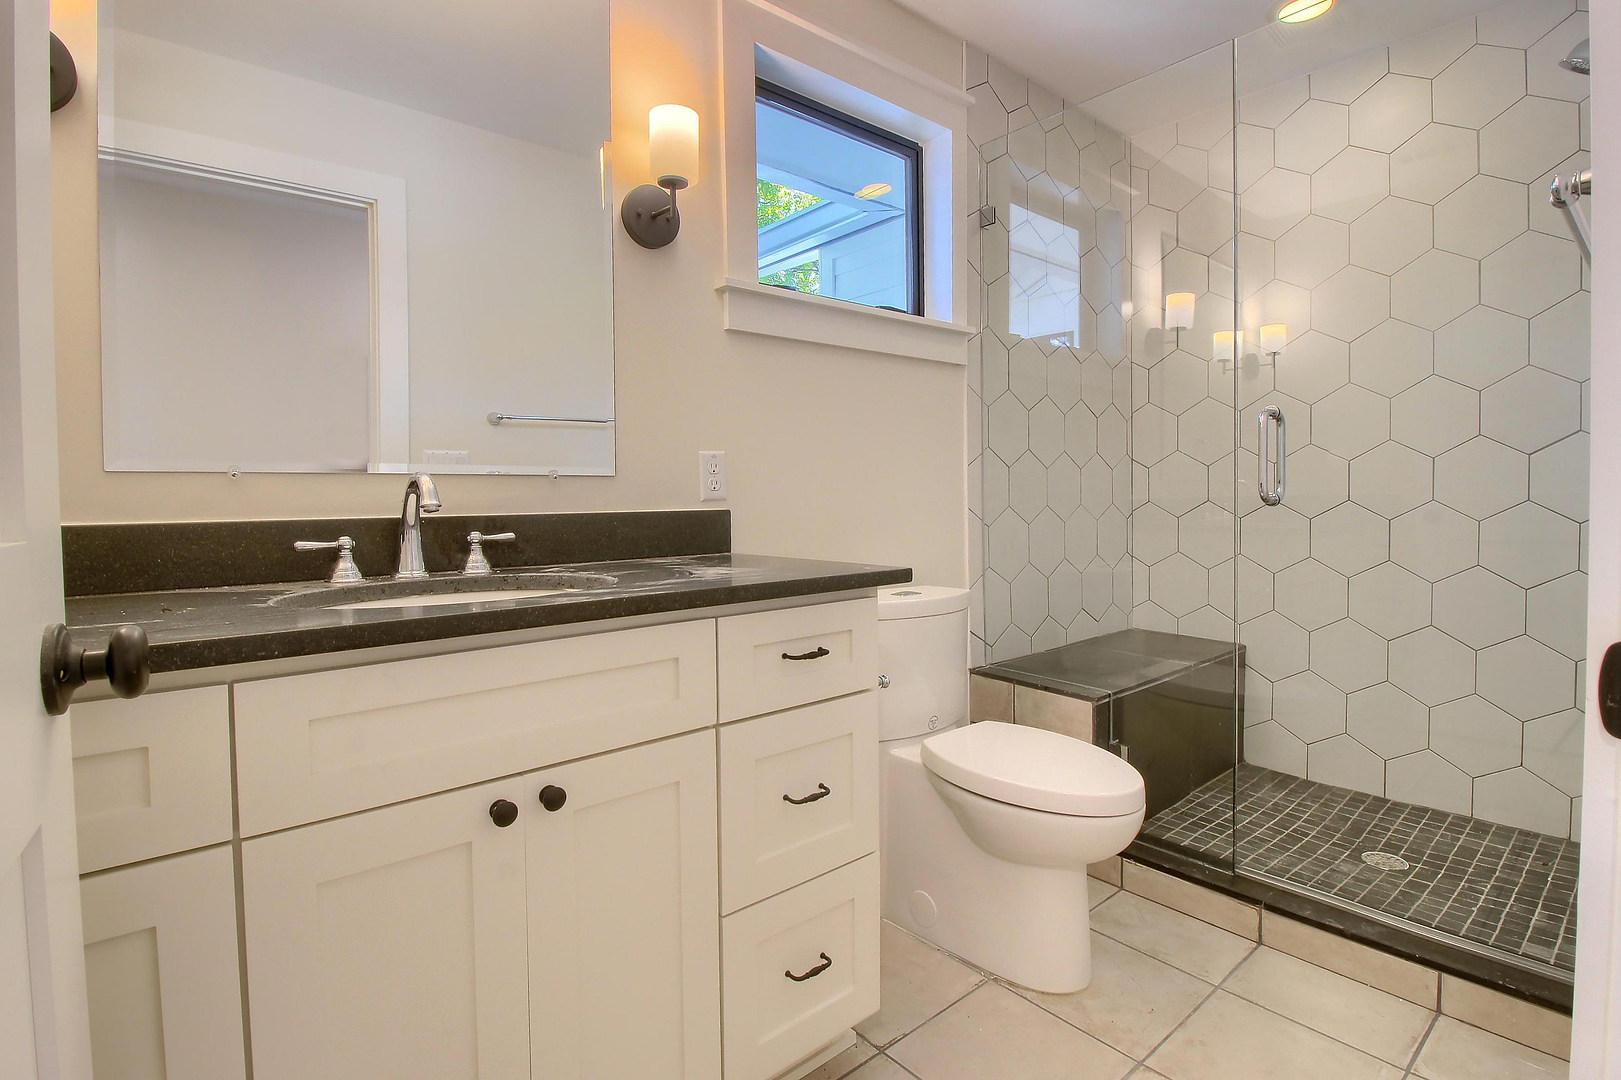 Home Renovation Guest Bathroom on Bouldin in Austin, TX